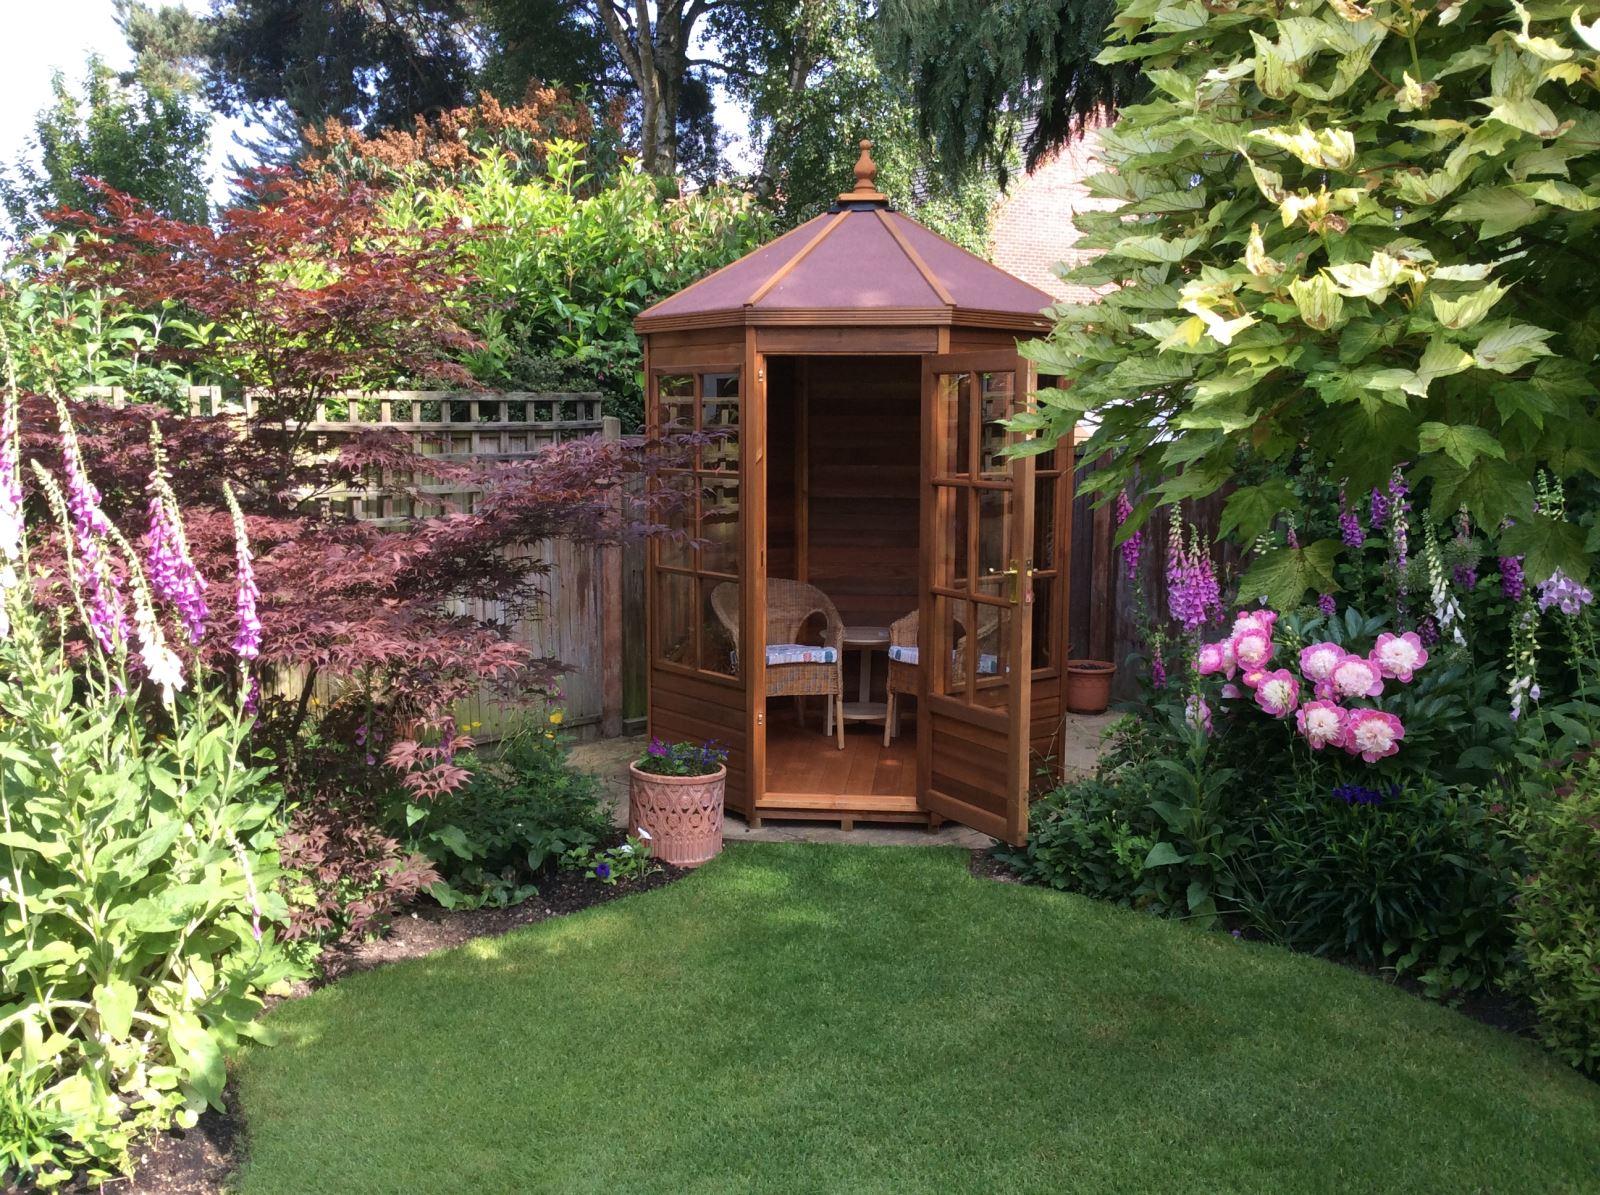 Countryside Octagonal Summer House